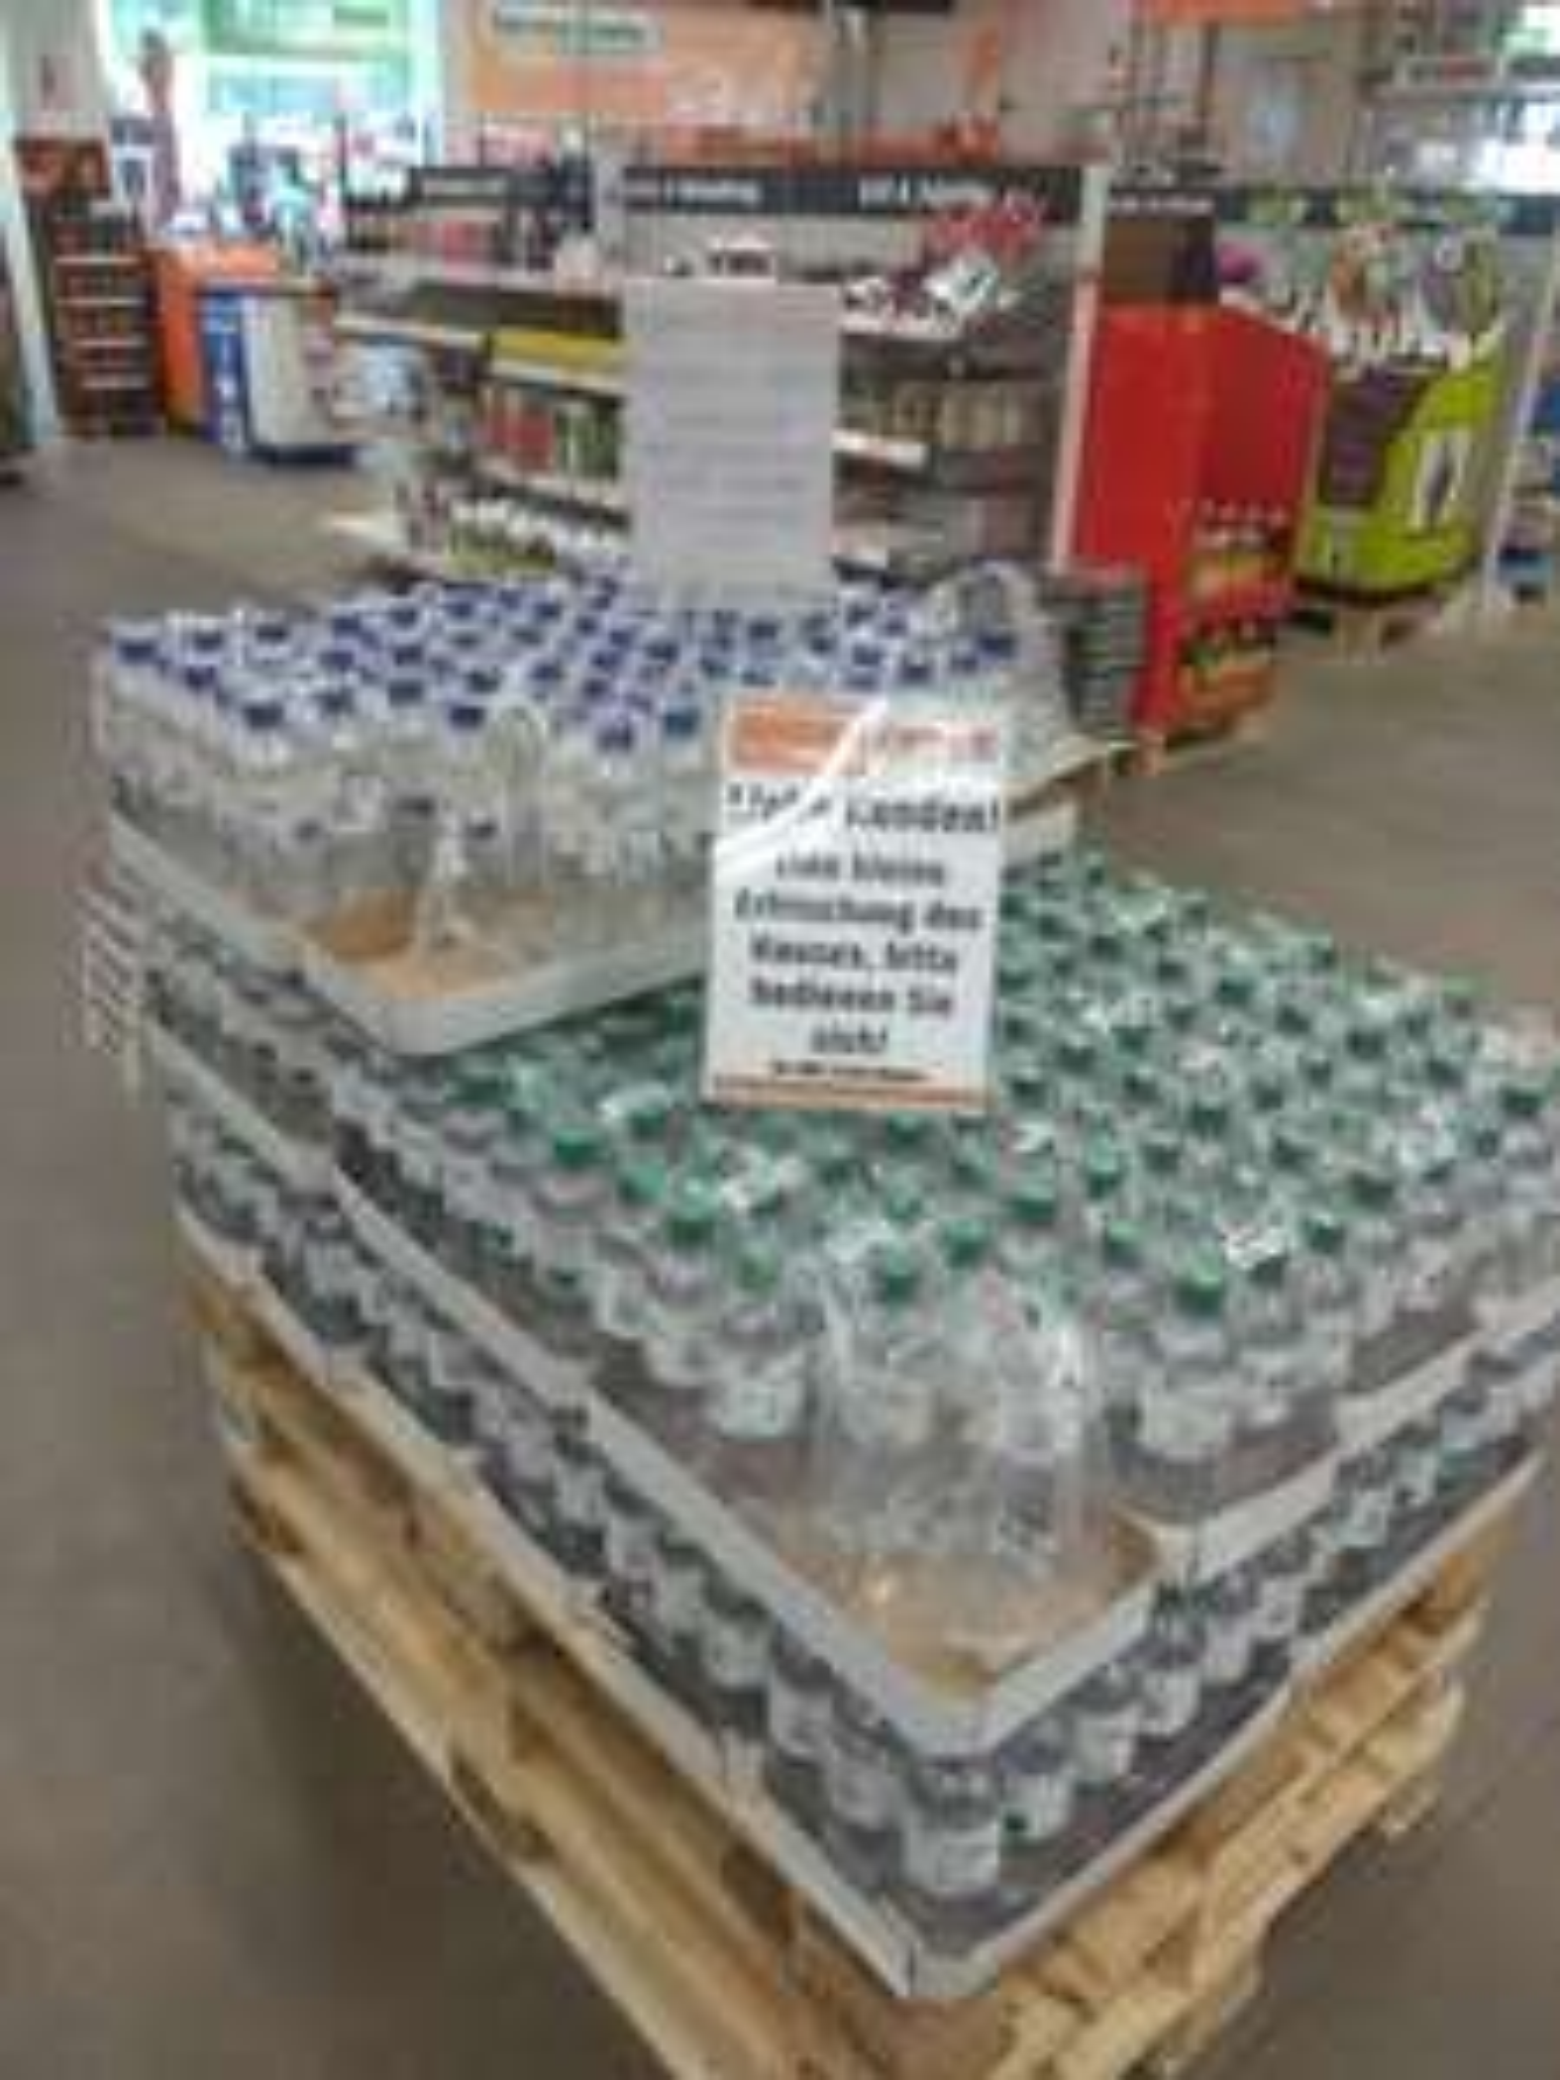 [Lokal][OBI Siegen] Kostenloses Wasser 0,5l Classic/medium